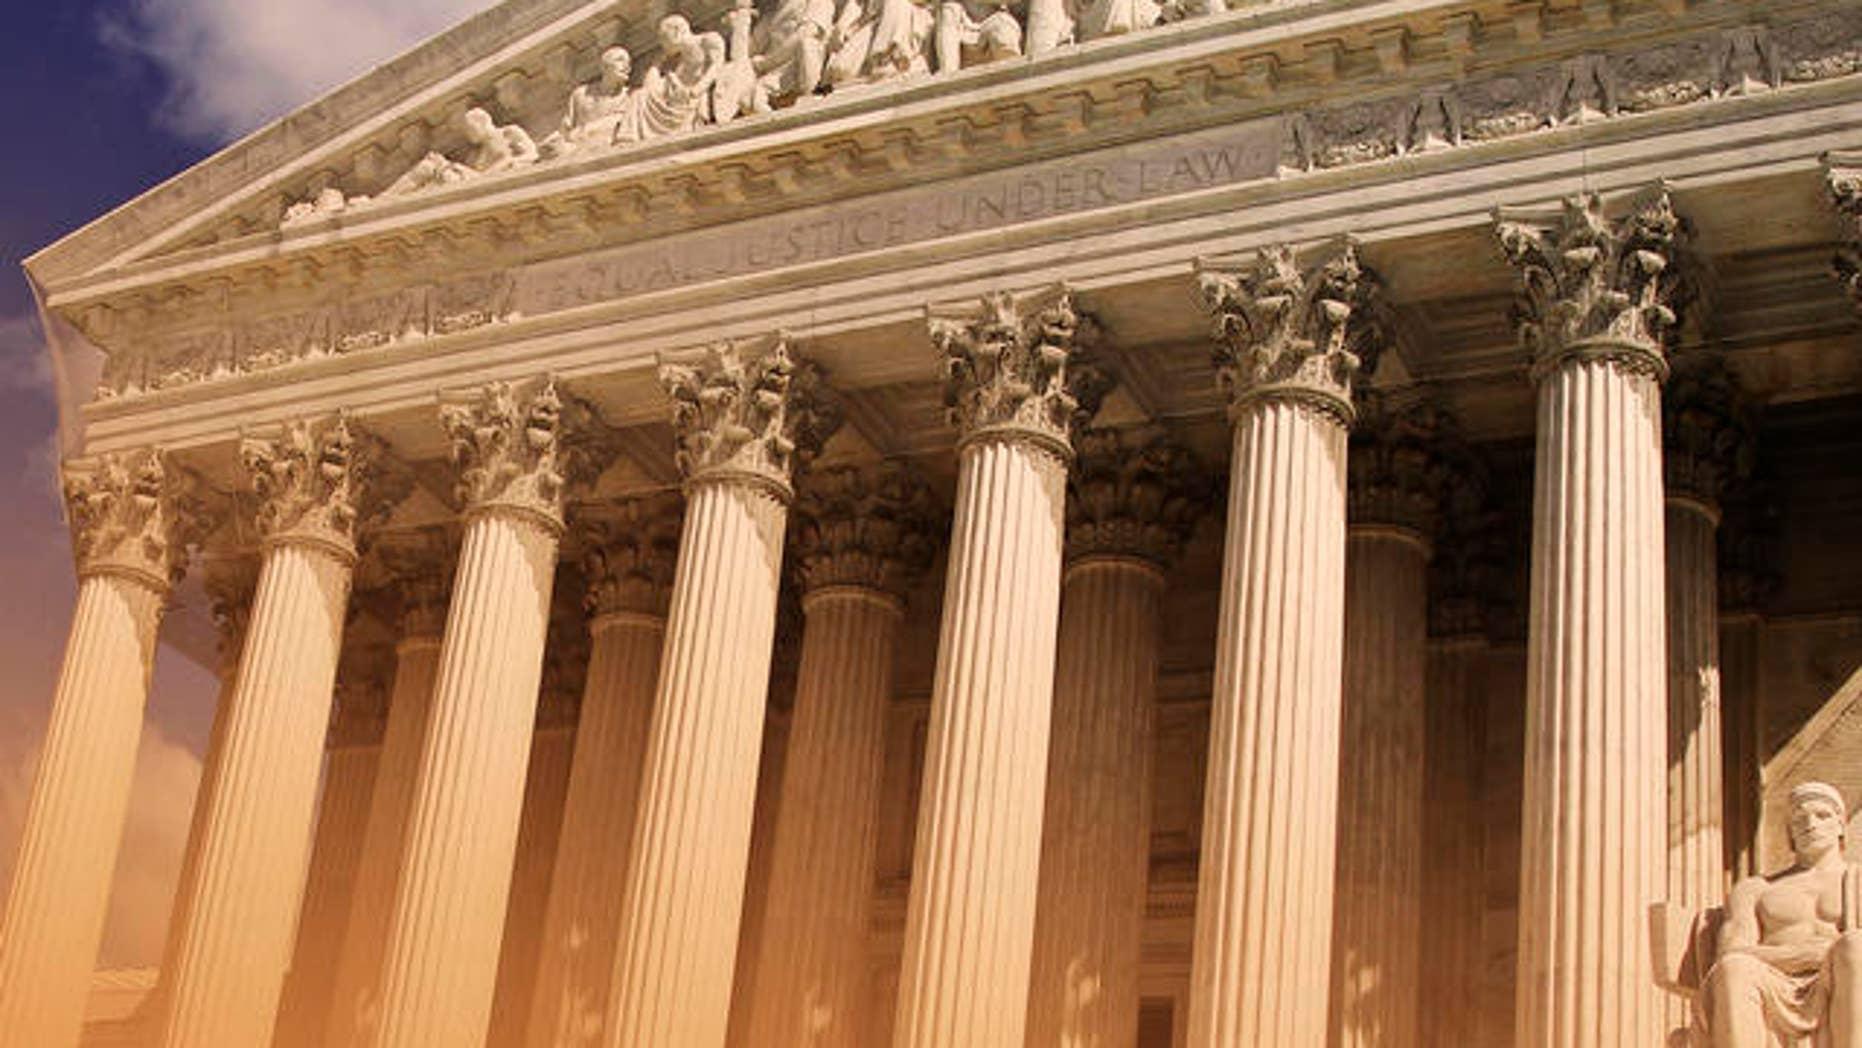 2010: The United States Supreme Court